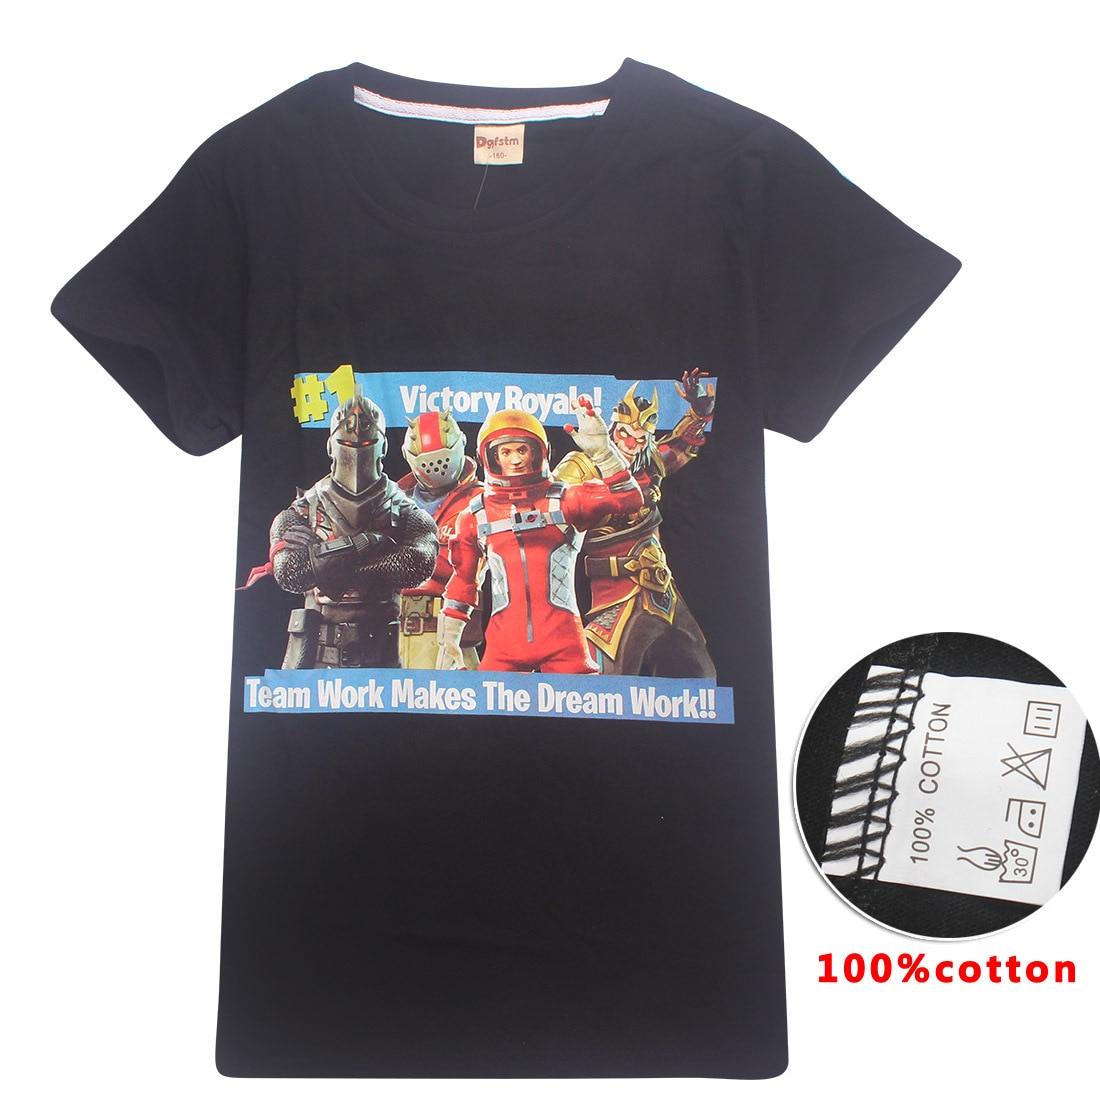 Hot Game Fortnite Shirt Kids Tops Summer Short Sleeve T Shirt Girls T-shirts Girls Boys Casual Tees 6-14Y Childrens Clothing